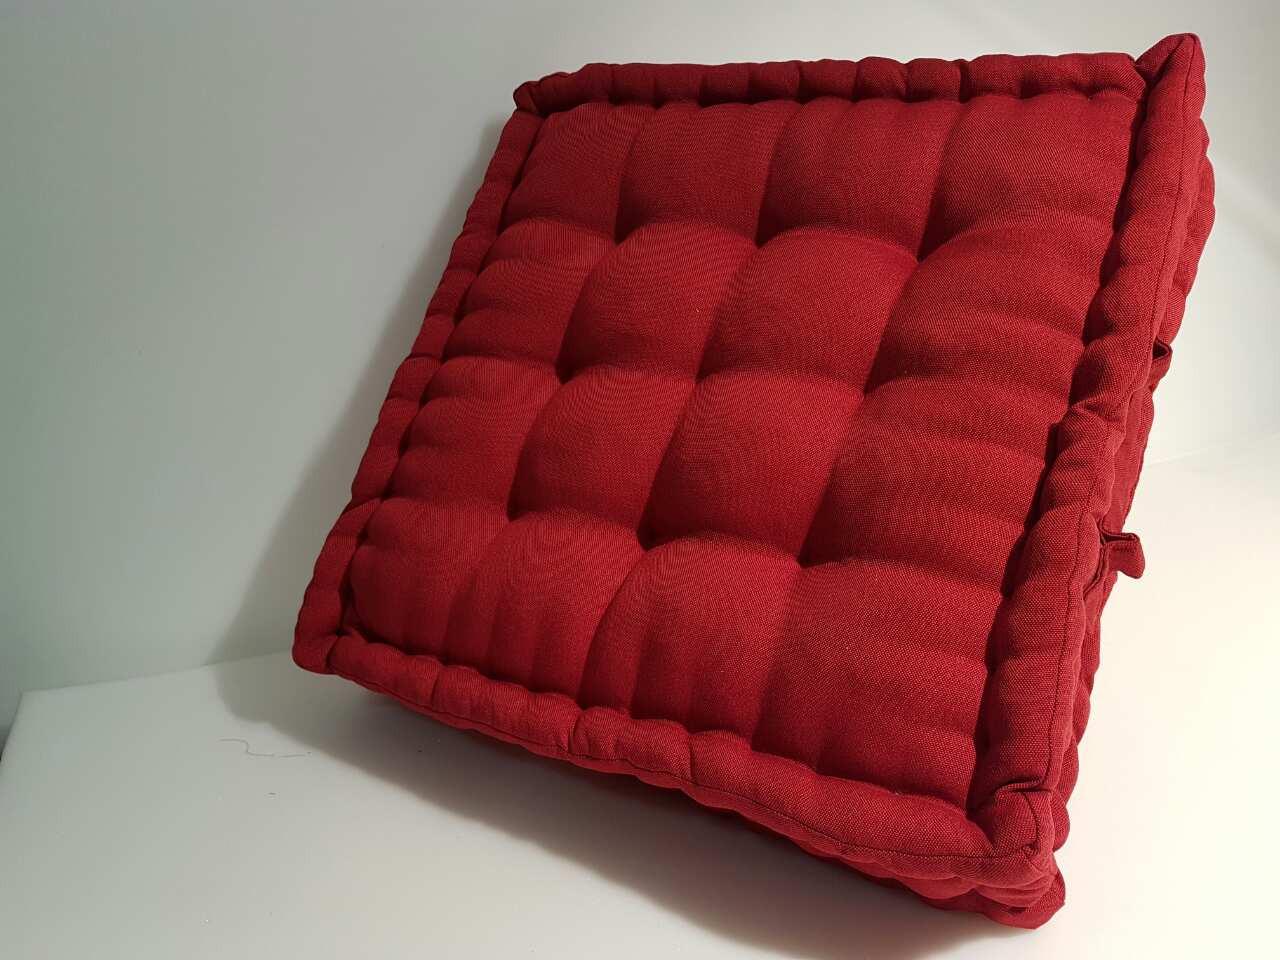 Об'ємна квадратна подушка з втяжки